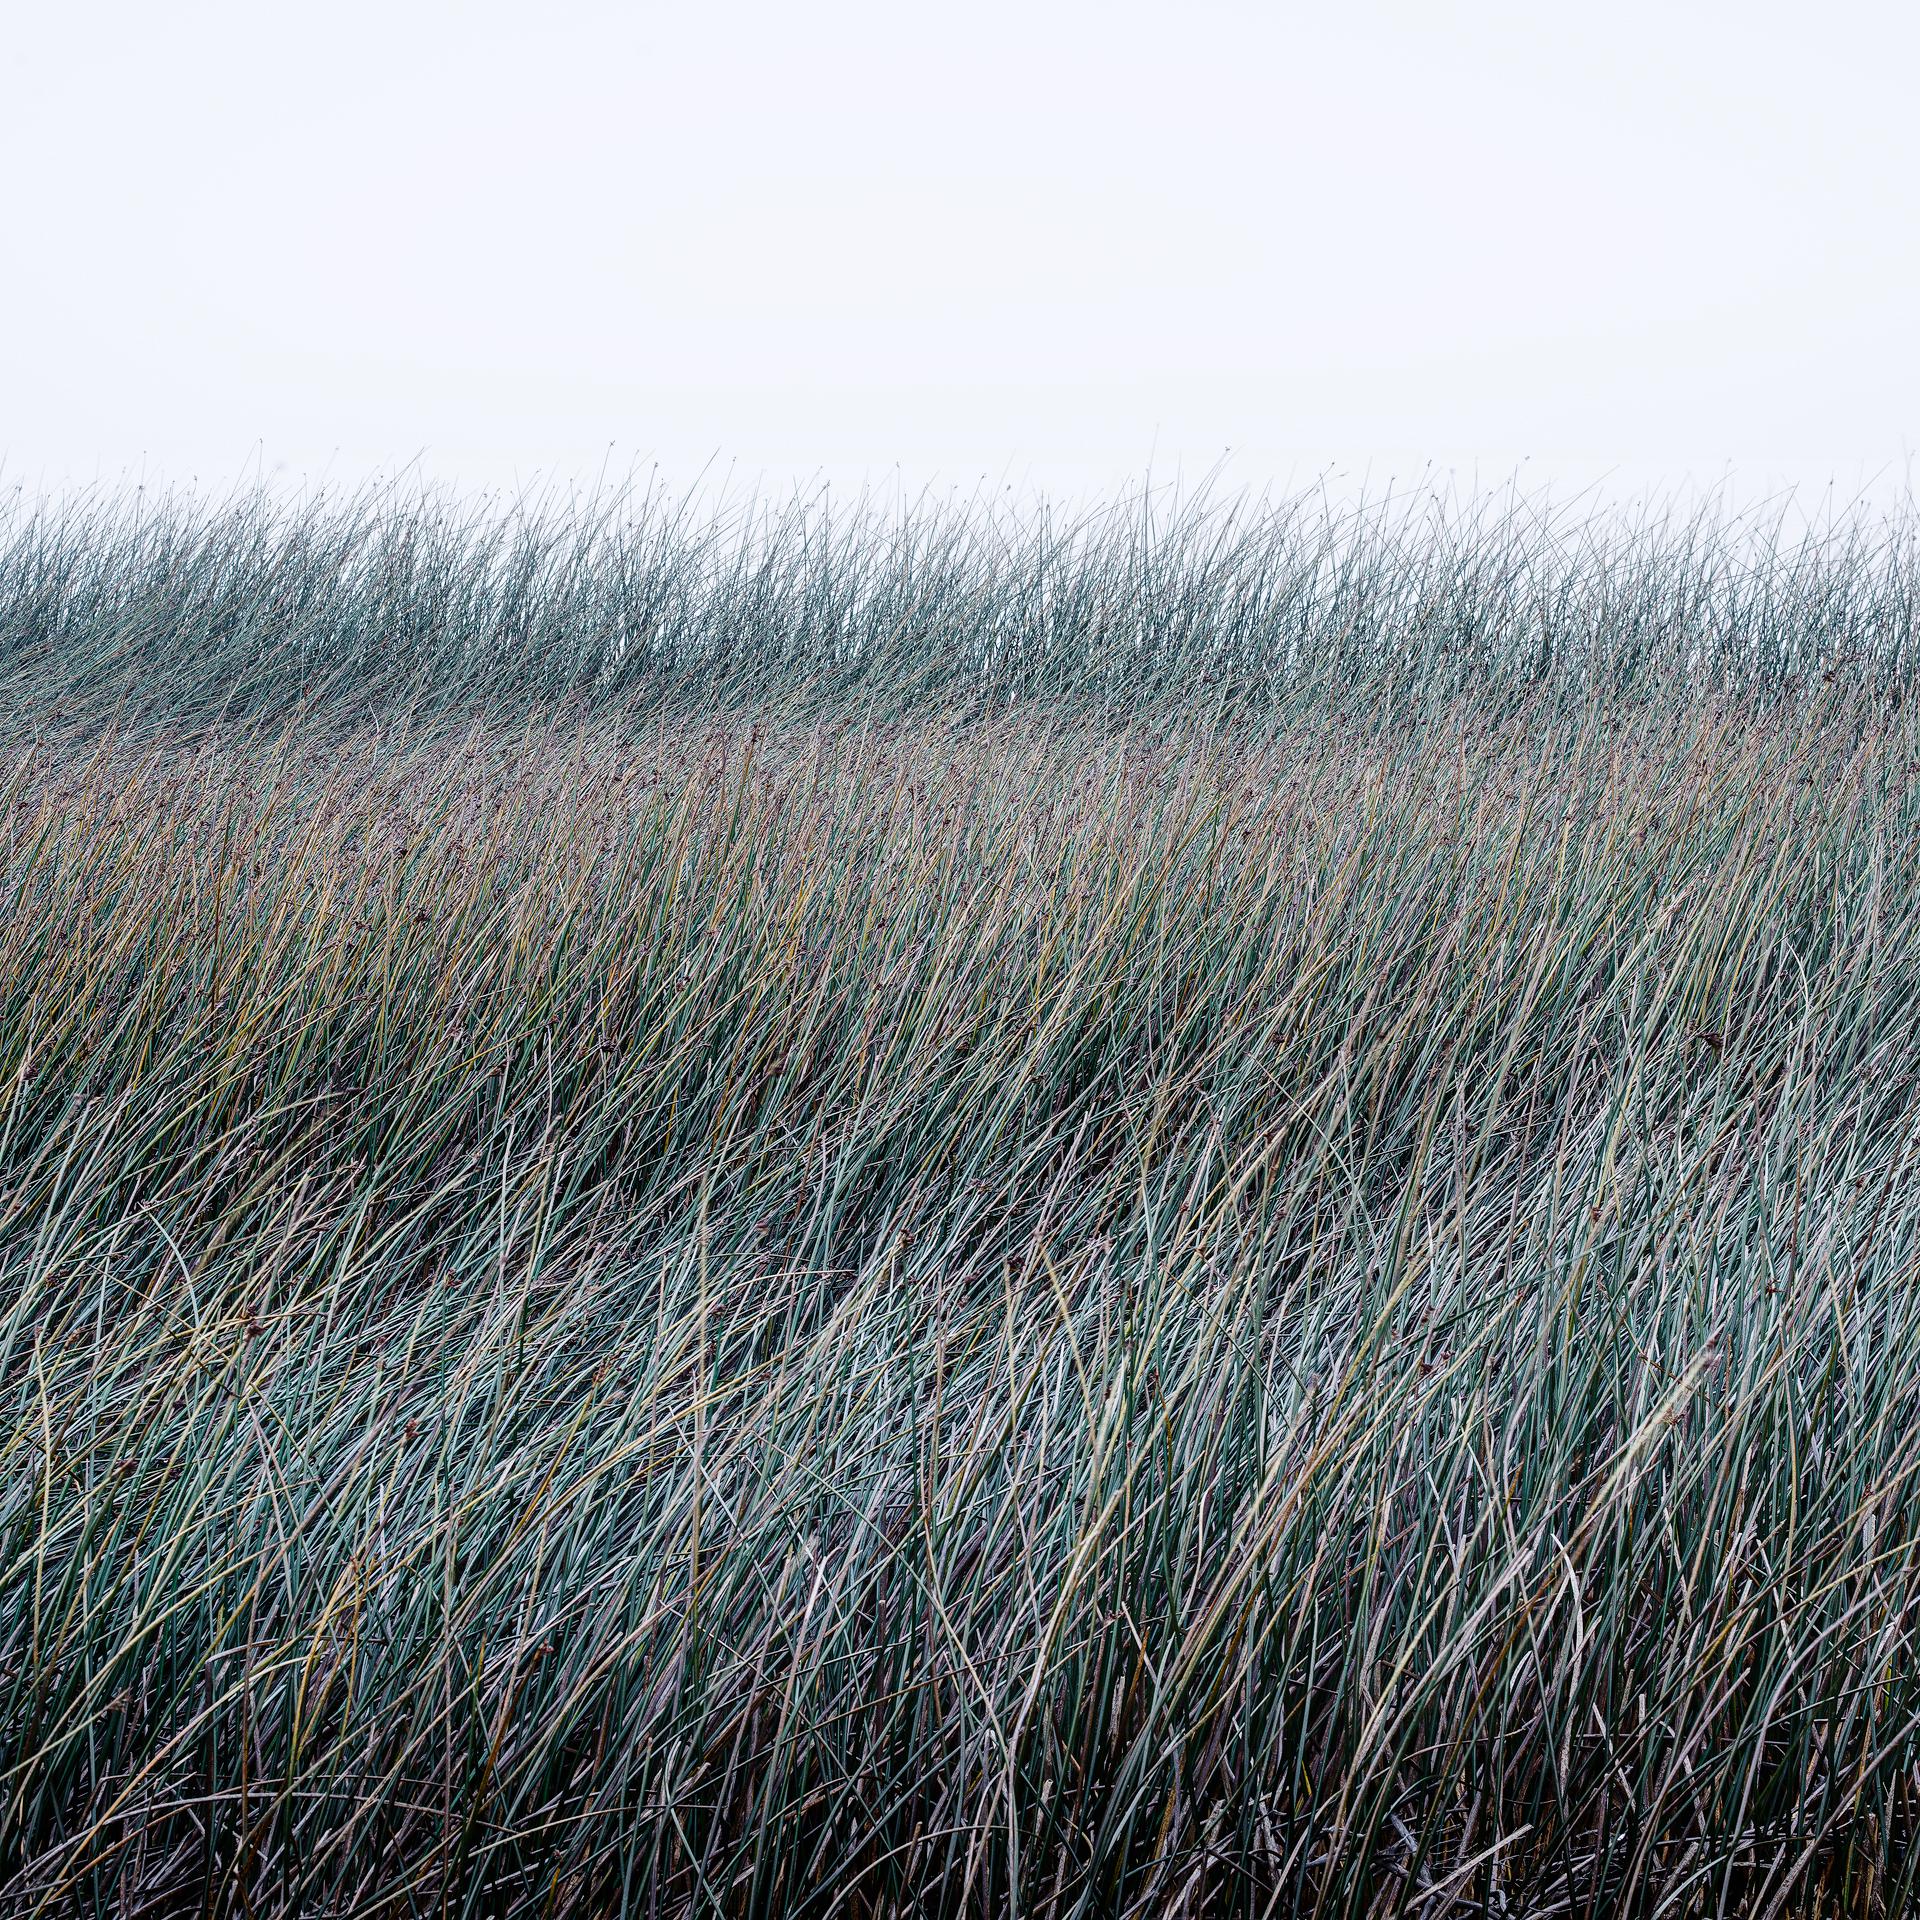 Reeds, study#1 - Torres del Paine, Patagonia